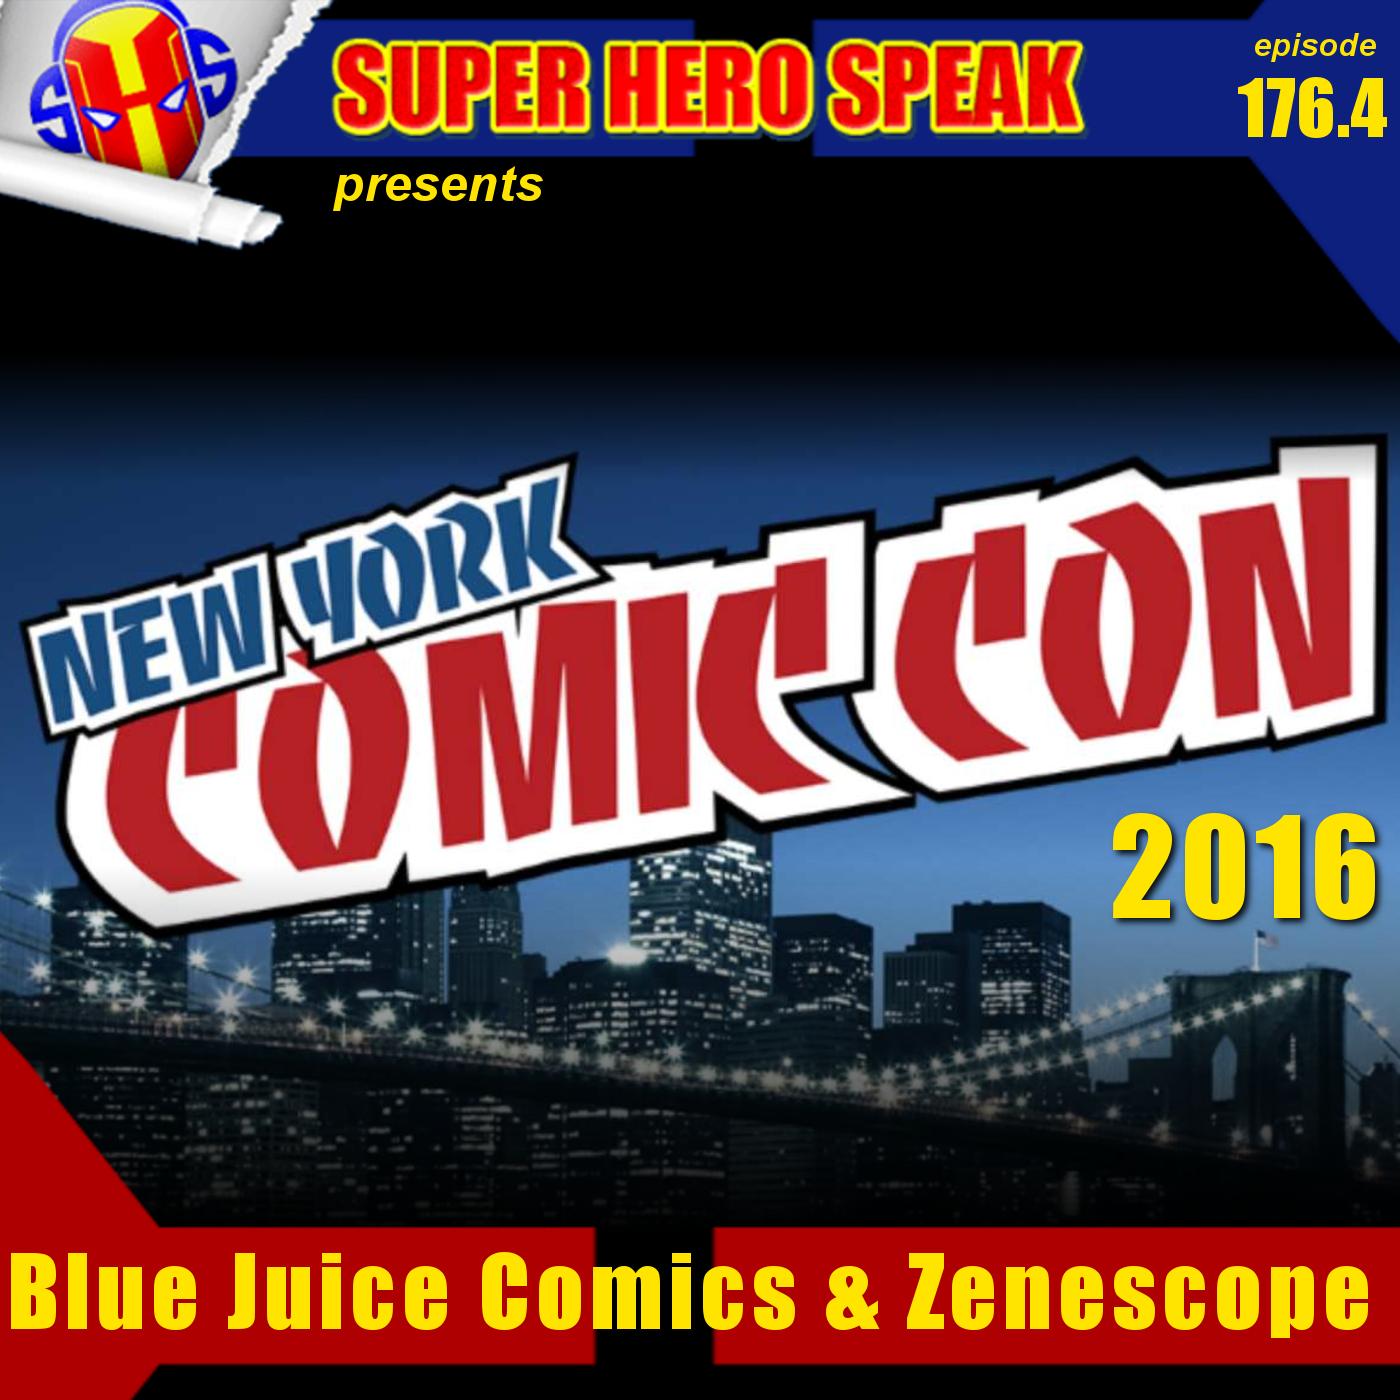 #176.4: Blue Juice Comics & Zenescope